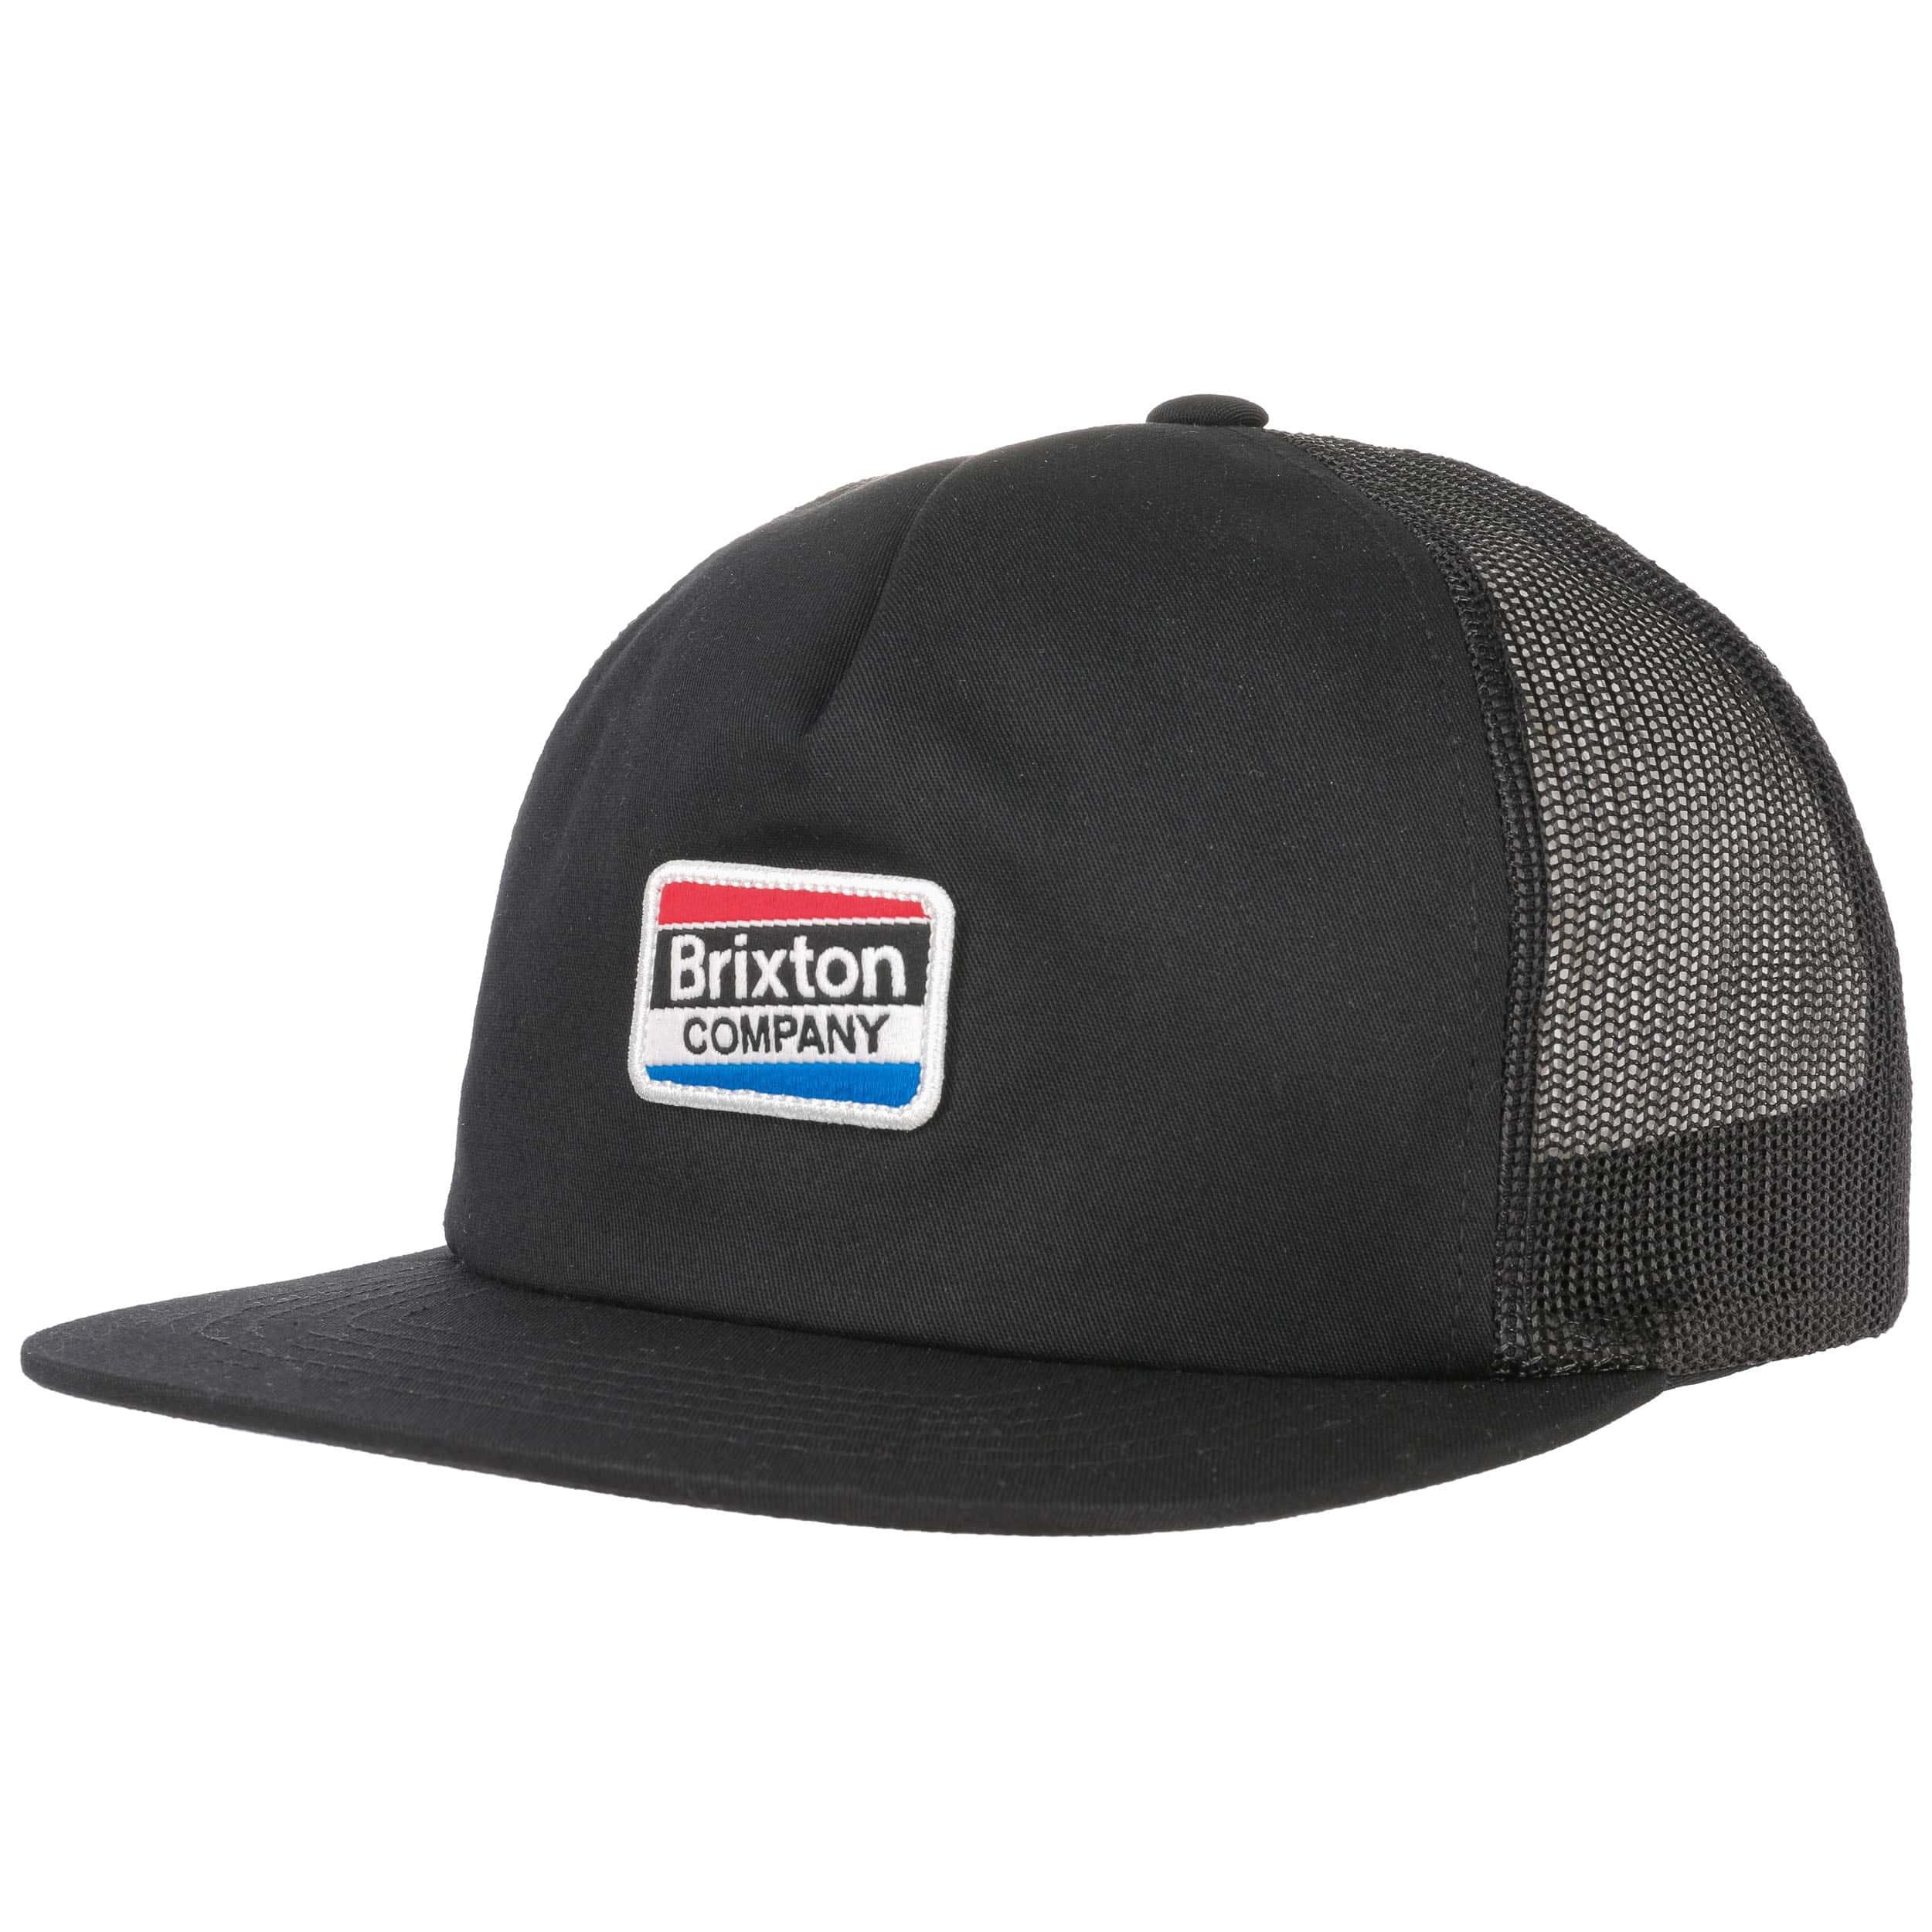 ... Worden Mesh Trucker Cap by Brixton - black 6 7dad53f22d12